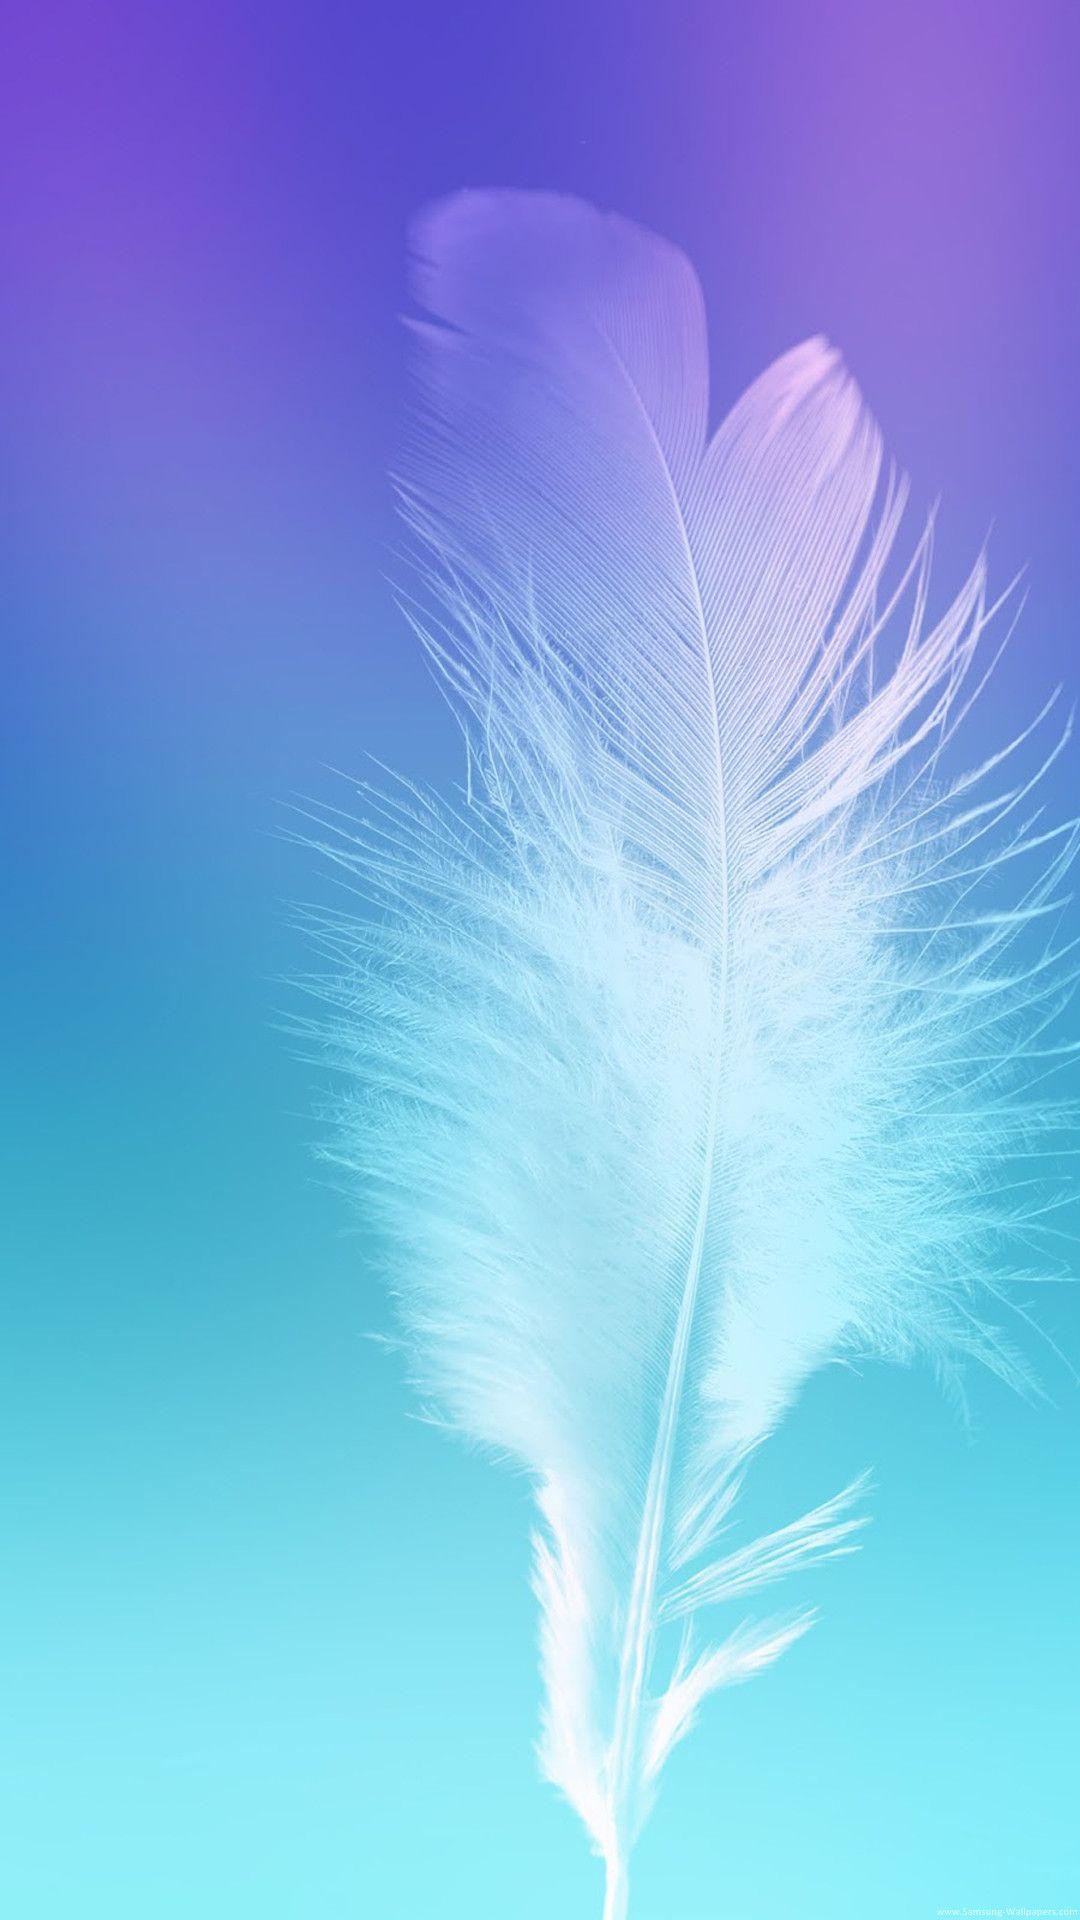 1080x1920 Feather Stock 1080x1920 Samsung Galaxy S7 Edge Wallpaper 1080x1920